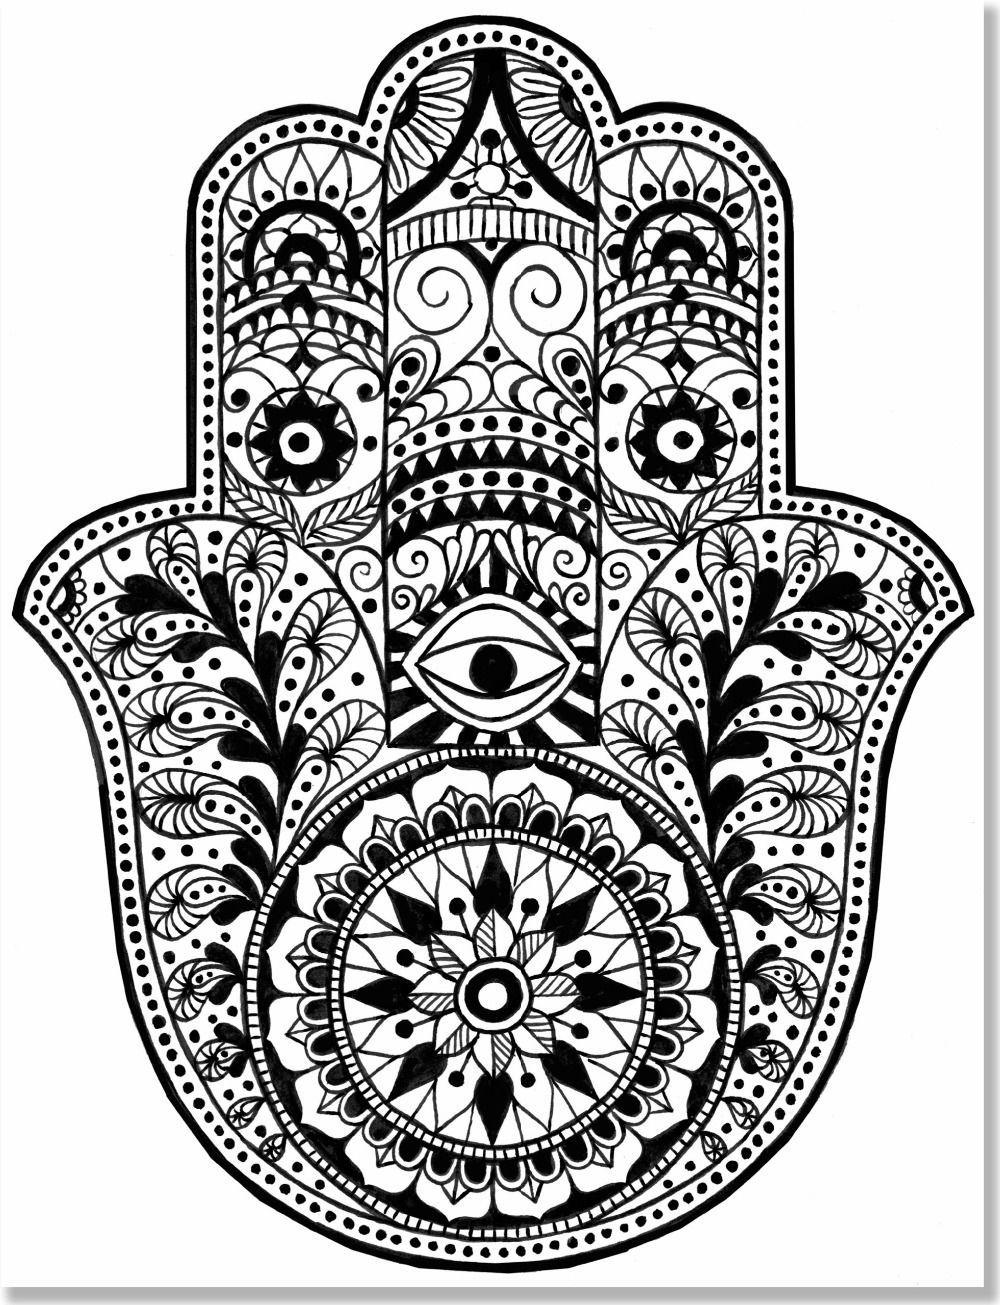 Mandala Drawing Bohemian Mandala Drawing Mandala Malvorlagen Mandala Ausmalen Wenn Du Mal Buch